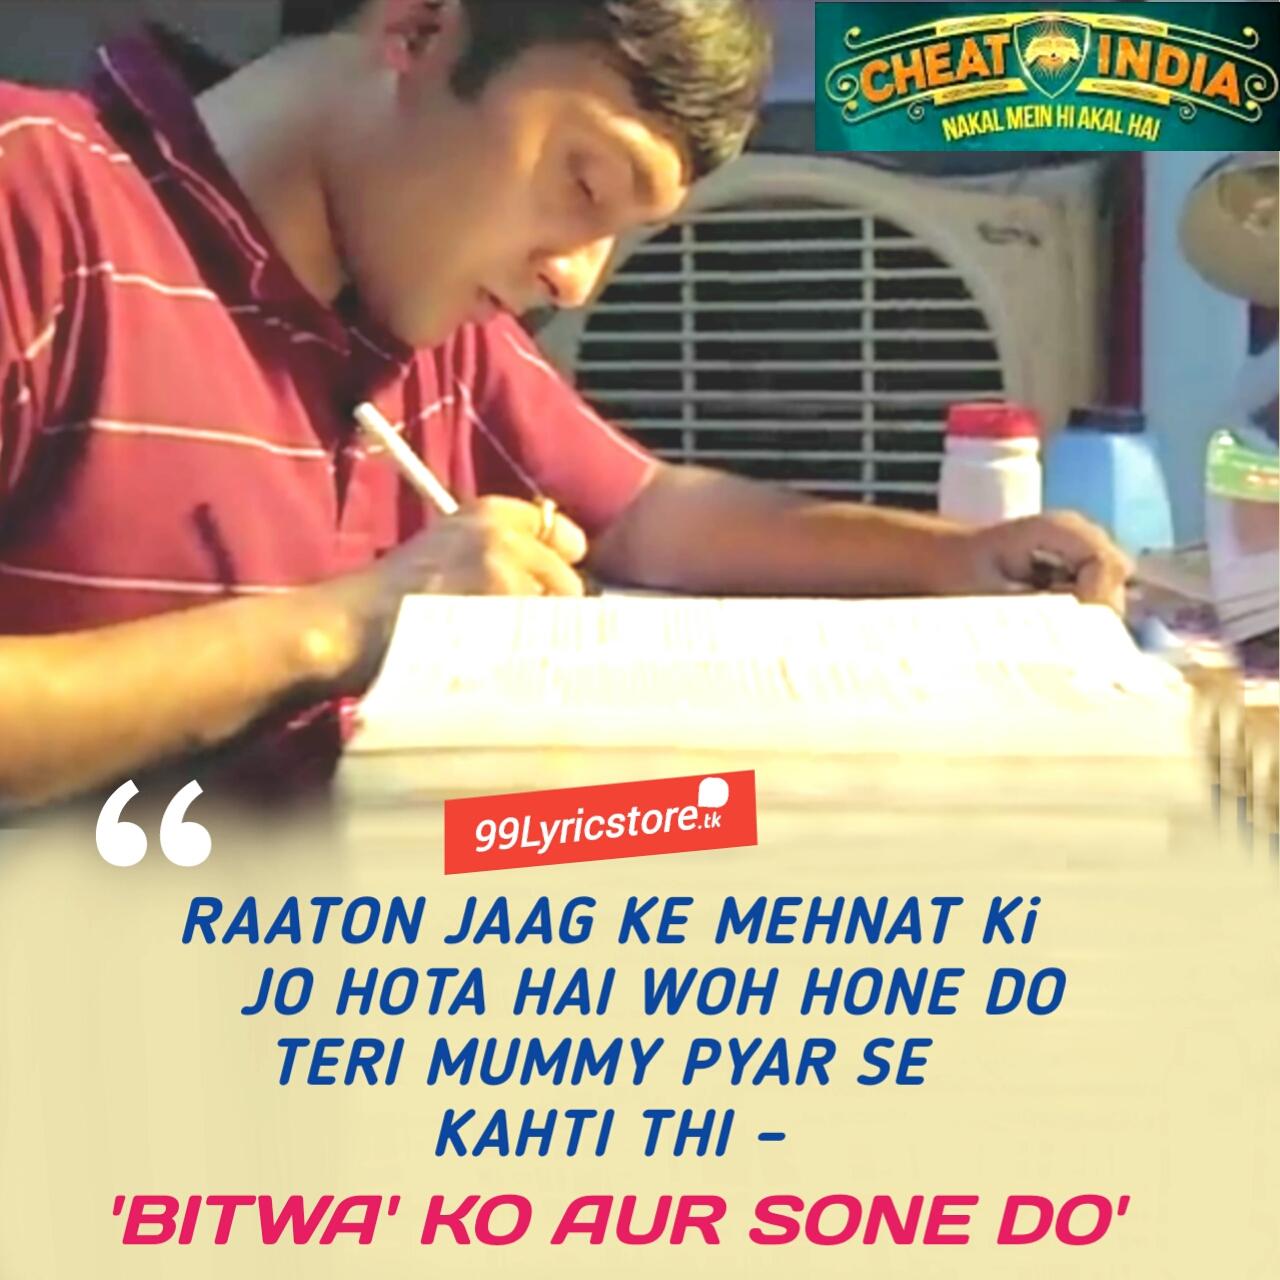 Kaamyaab Lyrics, Kaamyaab Lyrics cheat India, Emraan hashmi Kaamyaab song Lyrics, Cheat India Movie Song Lyrics, Cheat India Movie Song Kaamyaab Lyrics, Cheat India Movie Song Images